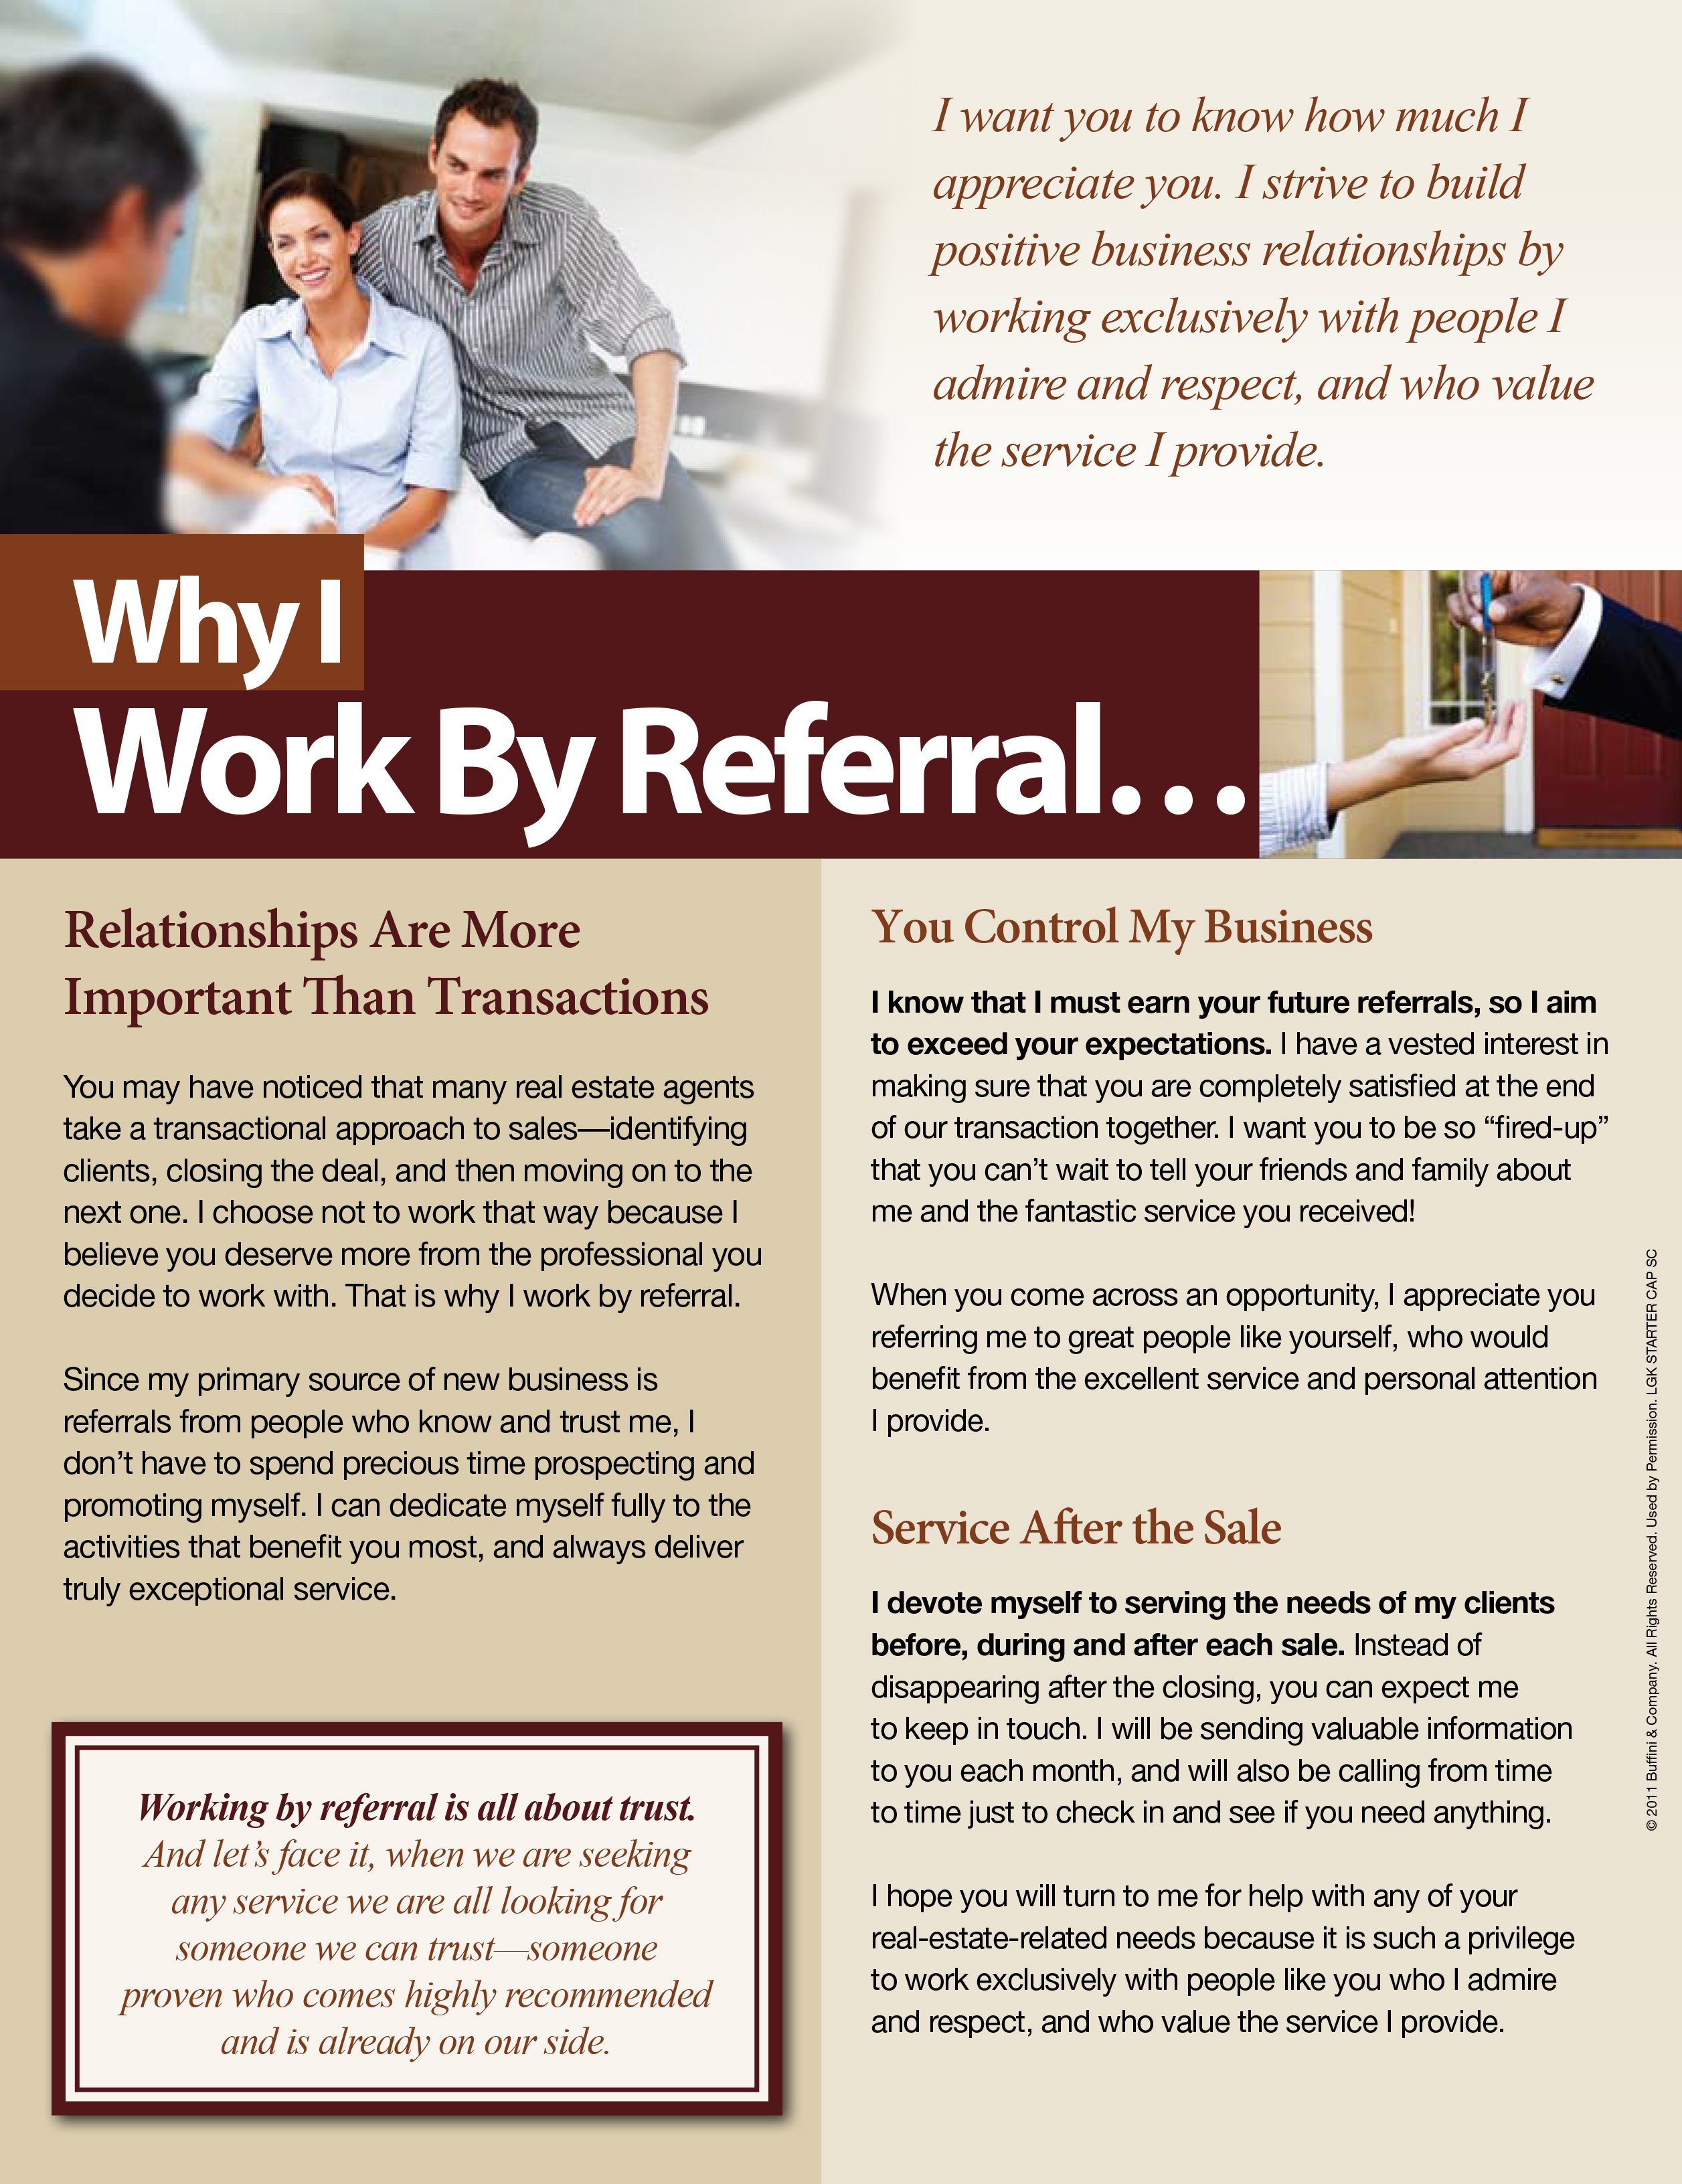 Why I Work By Referral-1.jpg